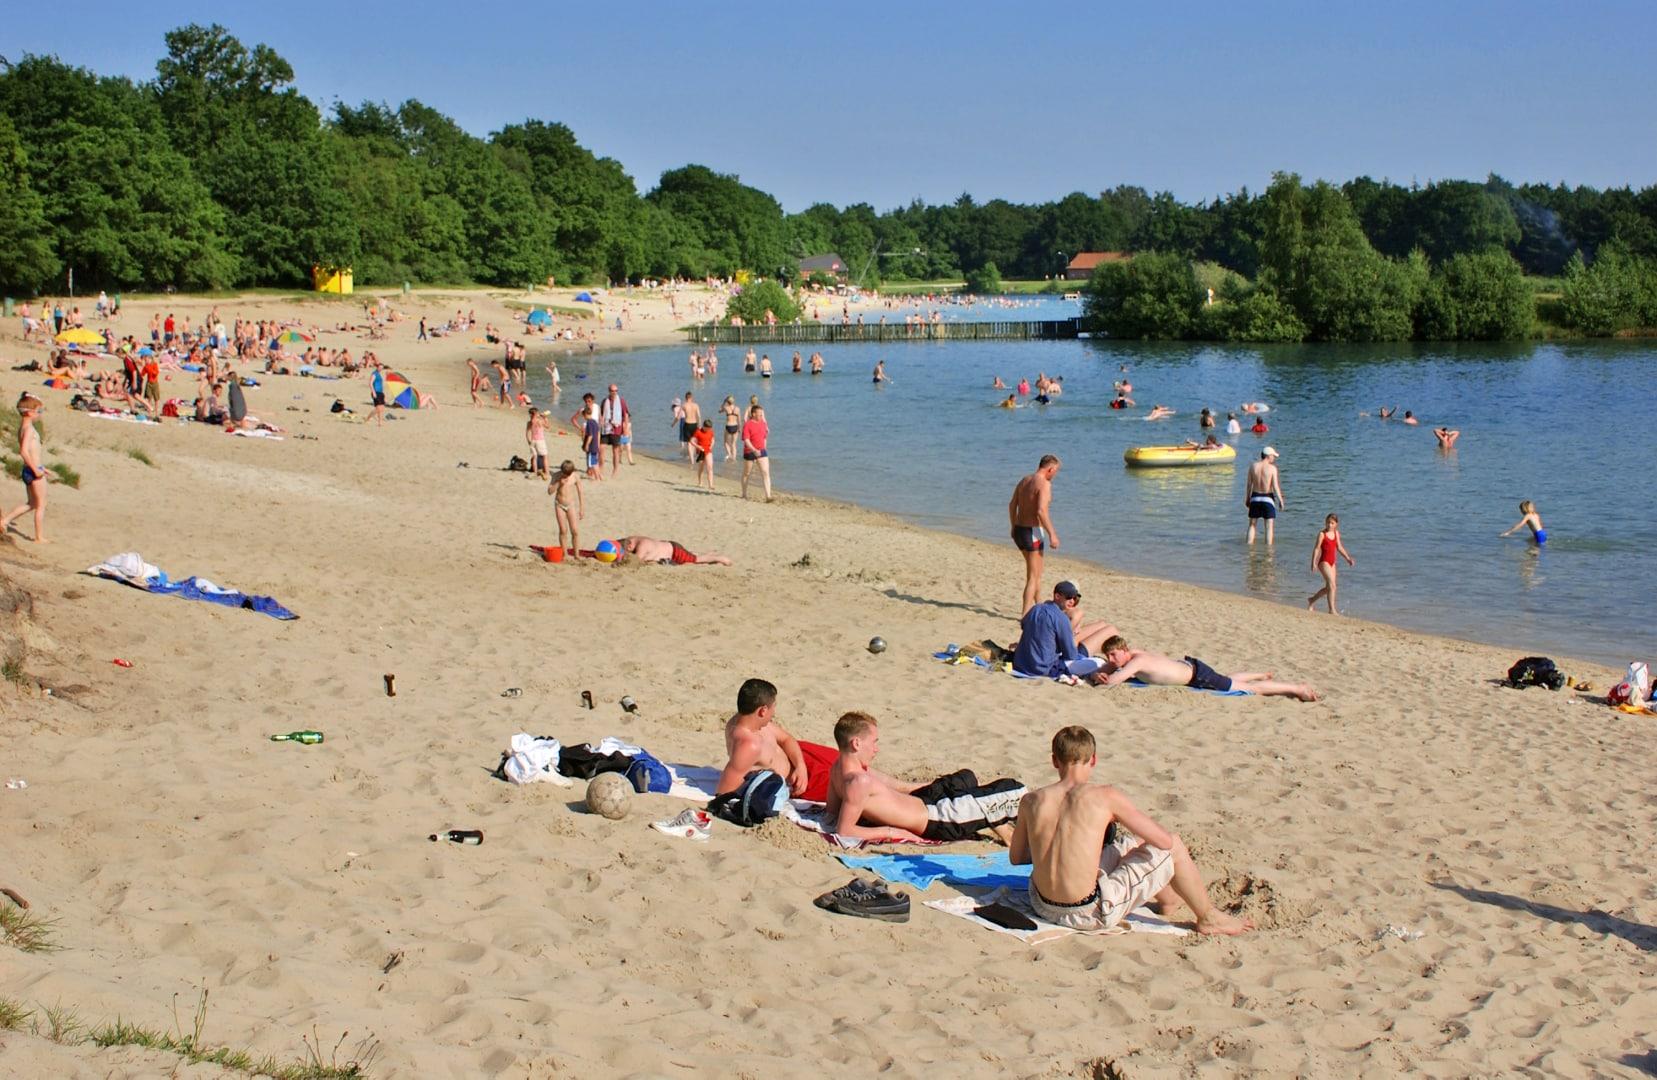 Gut Landegge Strand Dankernsee Umgebung Erlebnis Familienurlaub